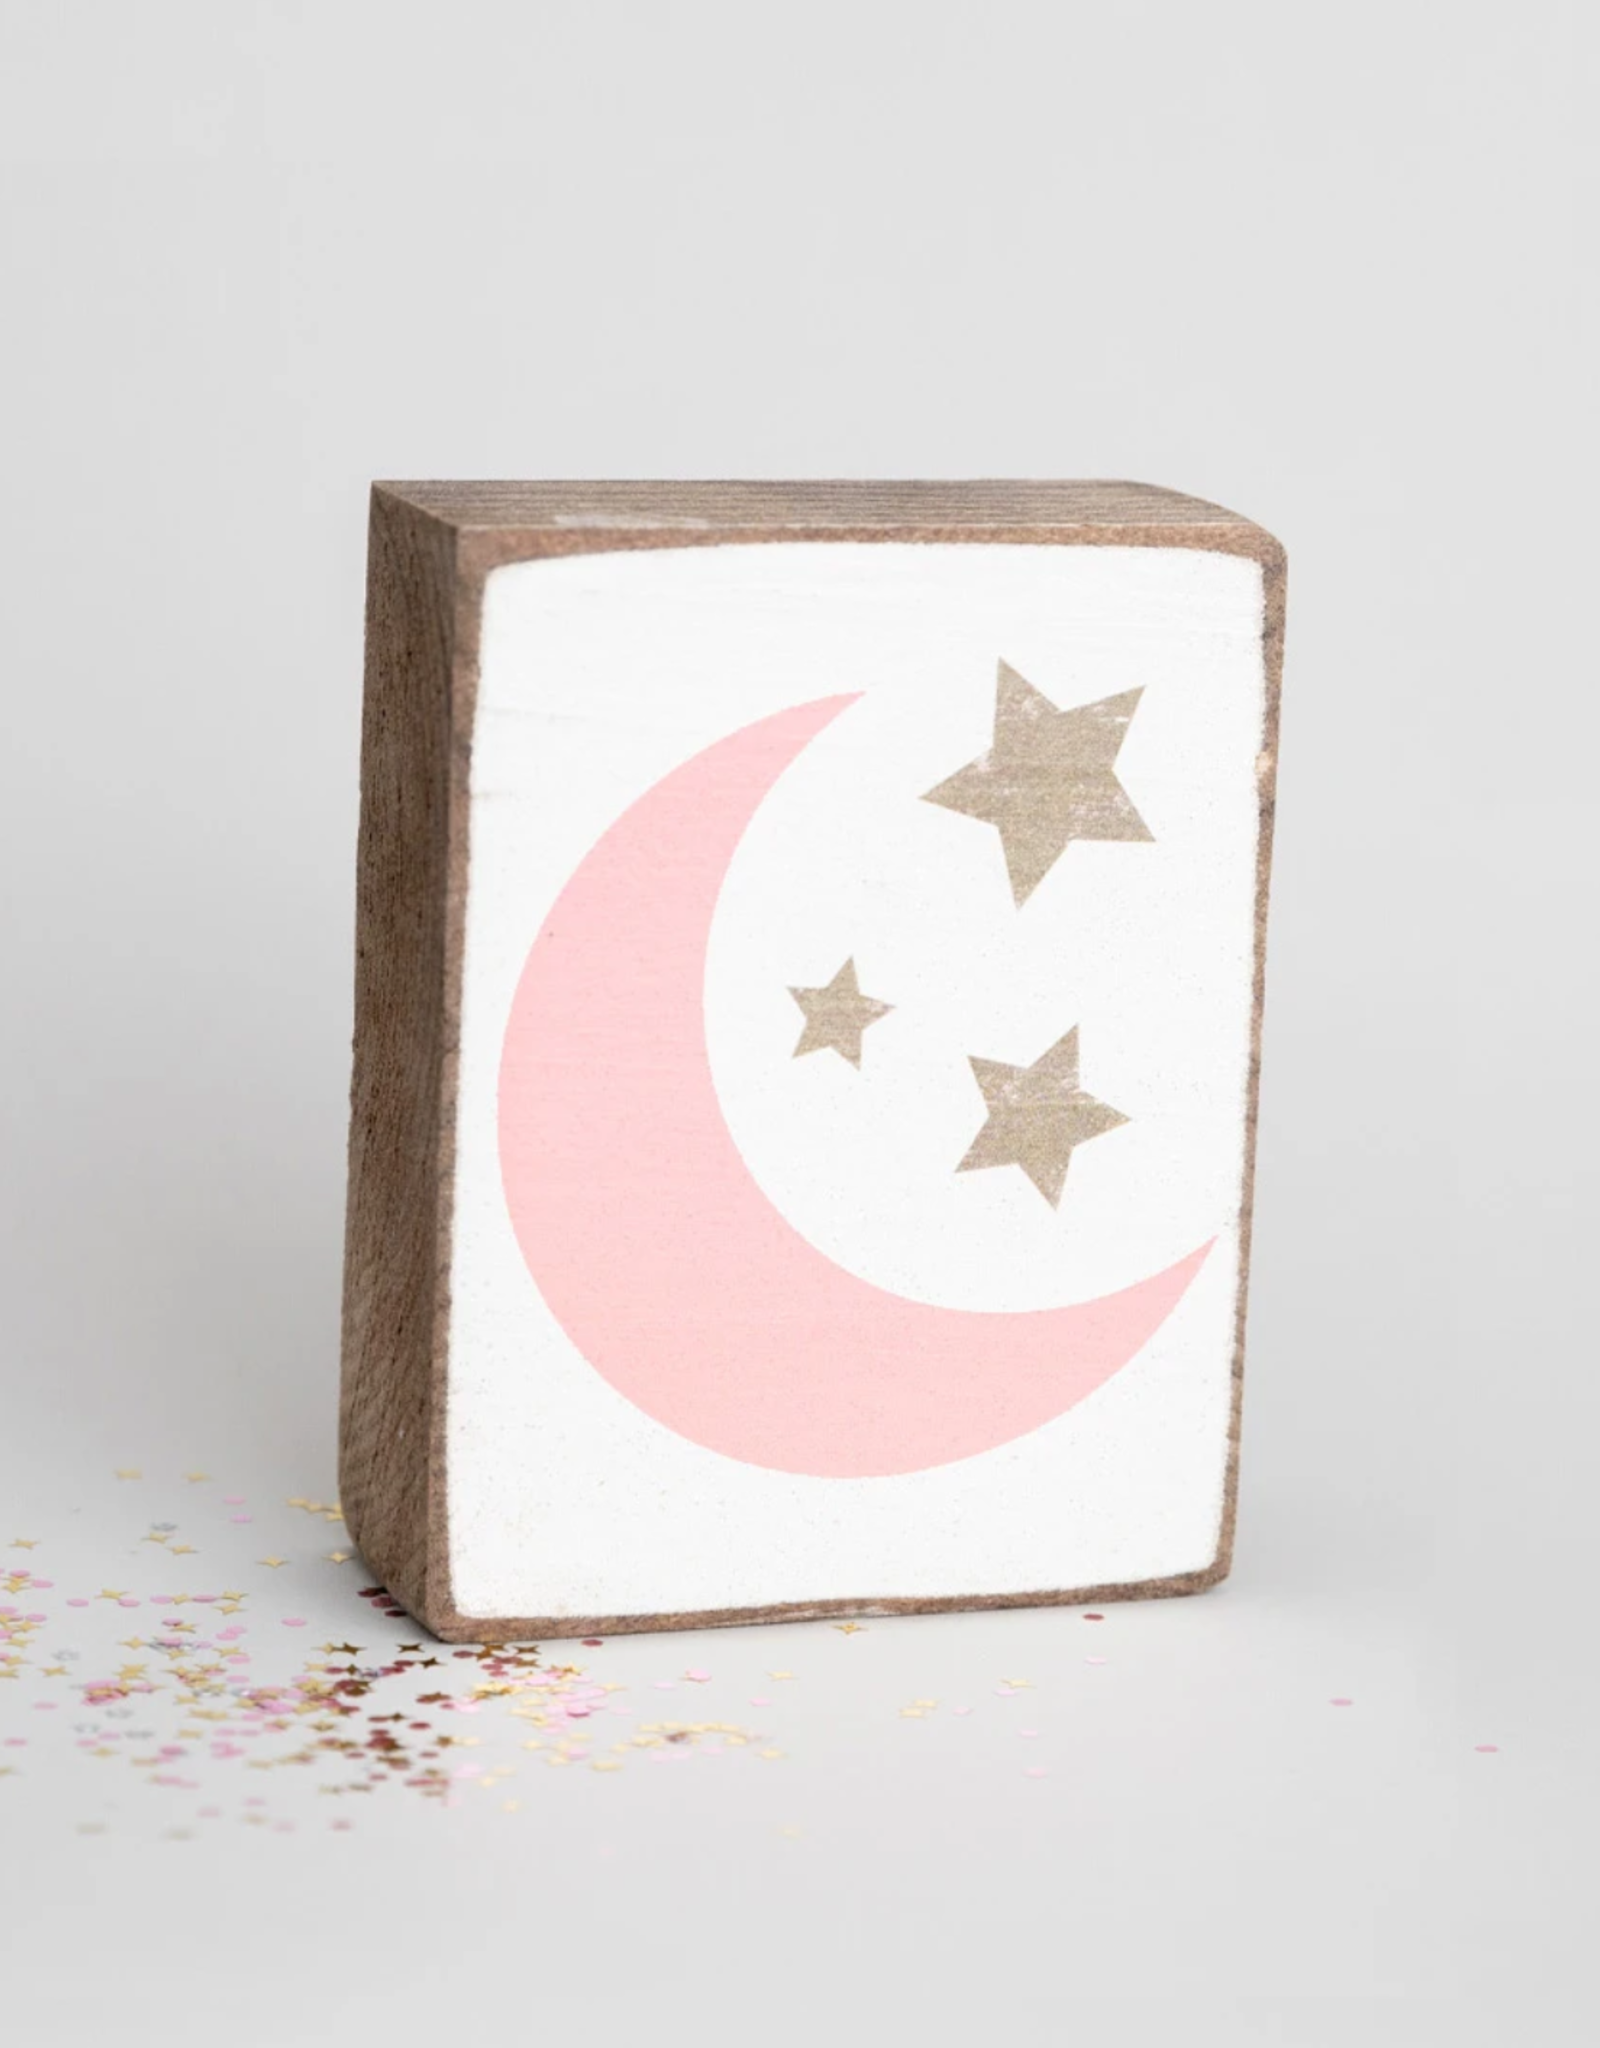 Rustic Marlin Rustic Marlin - Wood Block Moon + Stars Pink/Gold